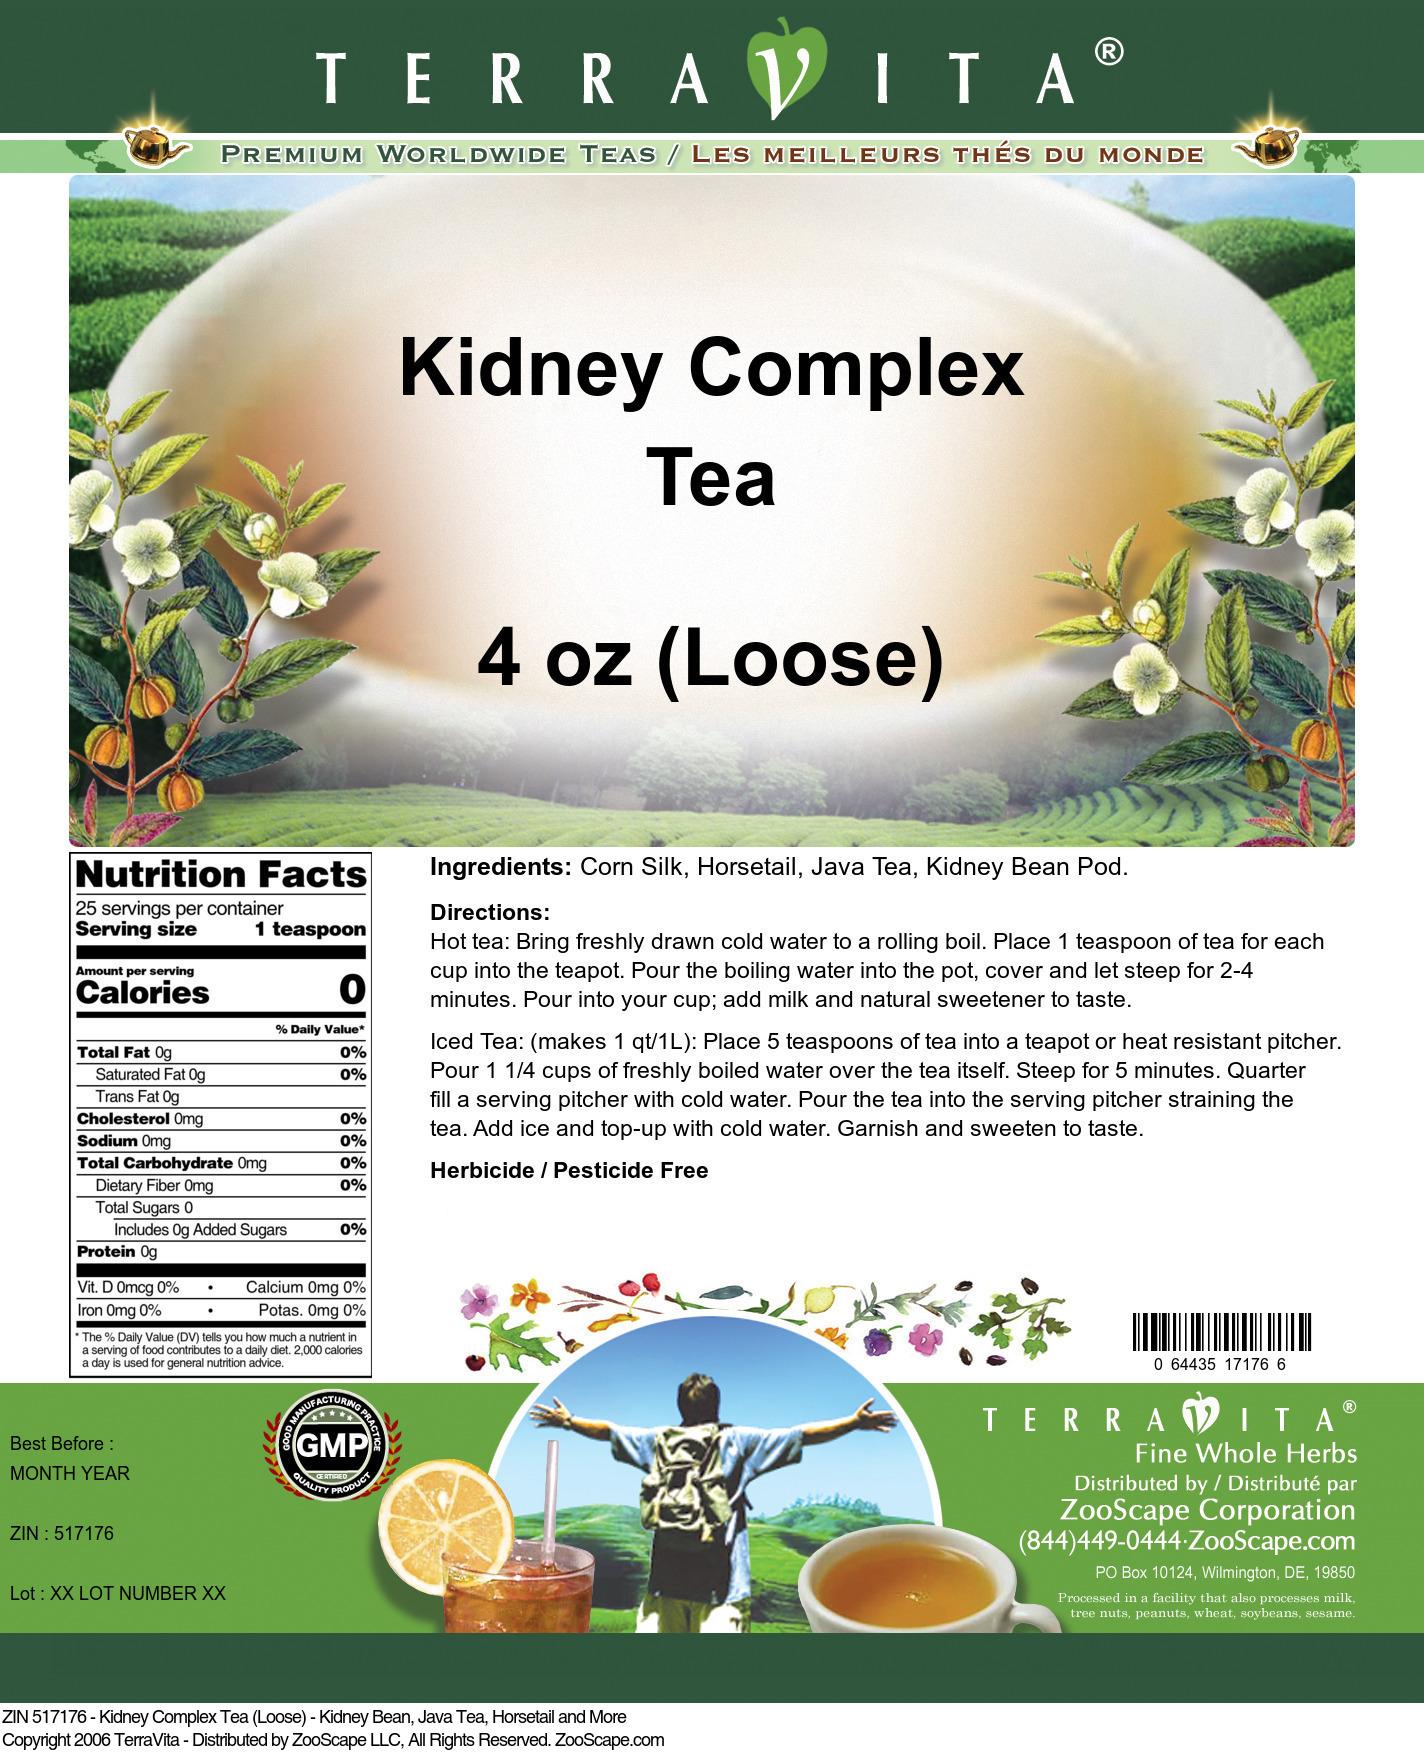 Kidney Complex Tea (Loose) - Kidney Bean, Java Tea, Horsetail and More